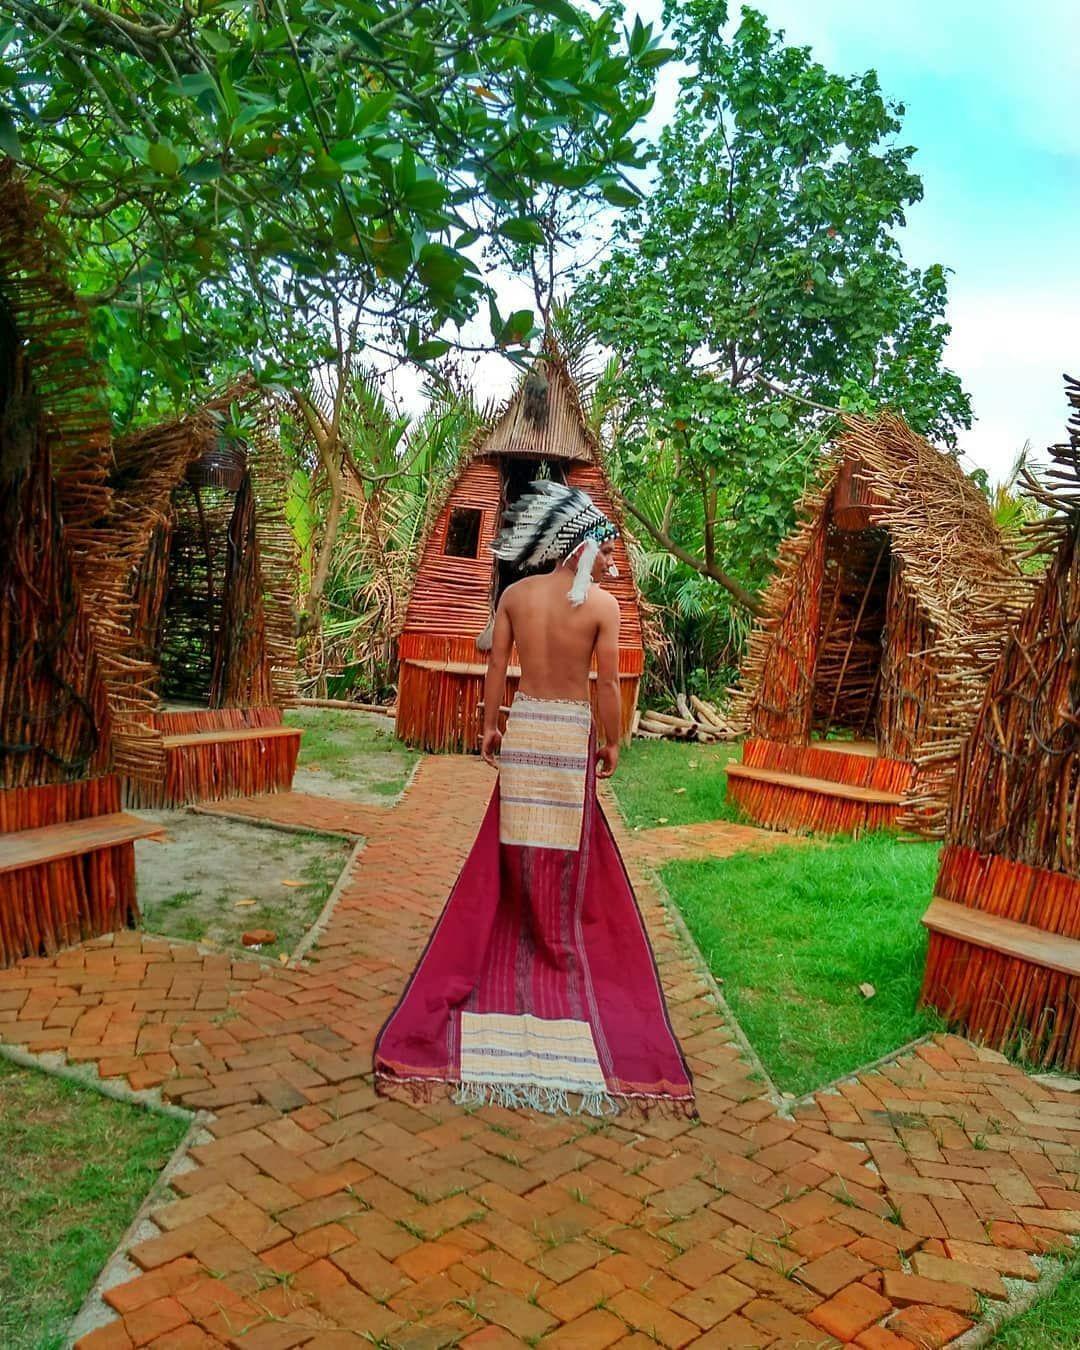 10 Alasan Kamu Harus Main ke Wisata Alam Datuk di Batubara, Sumut